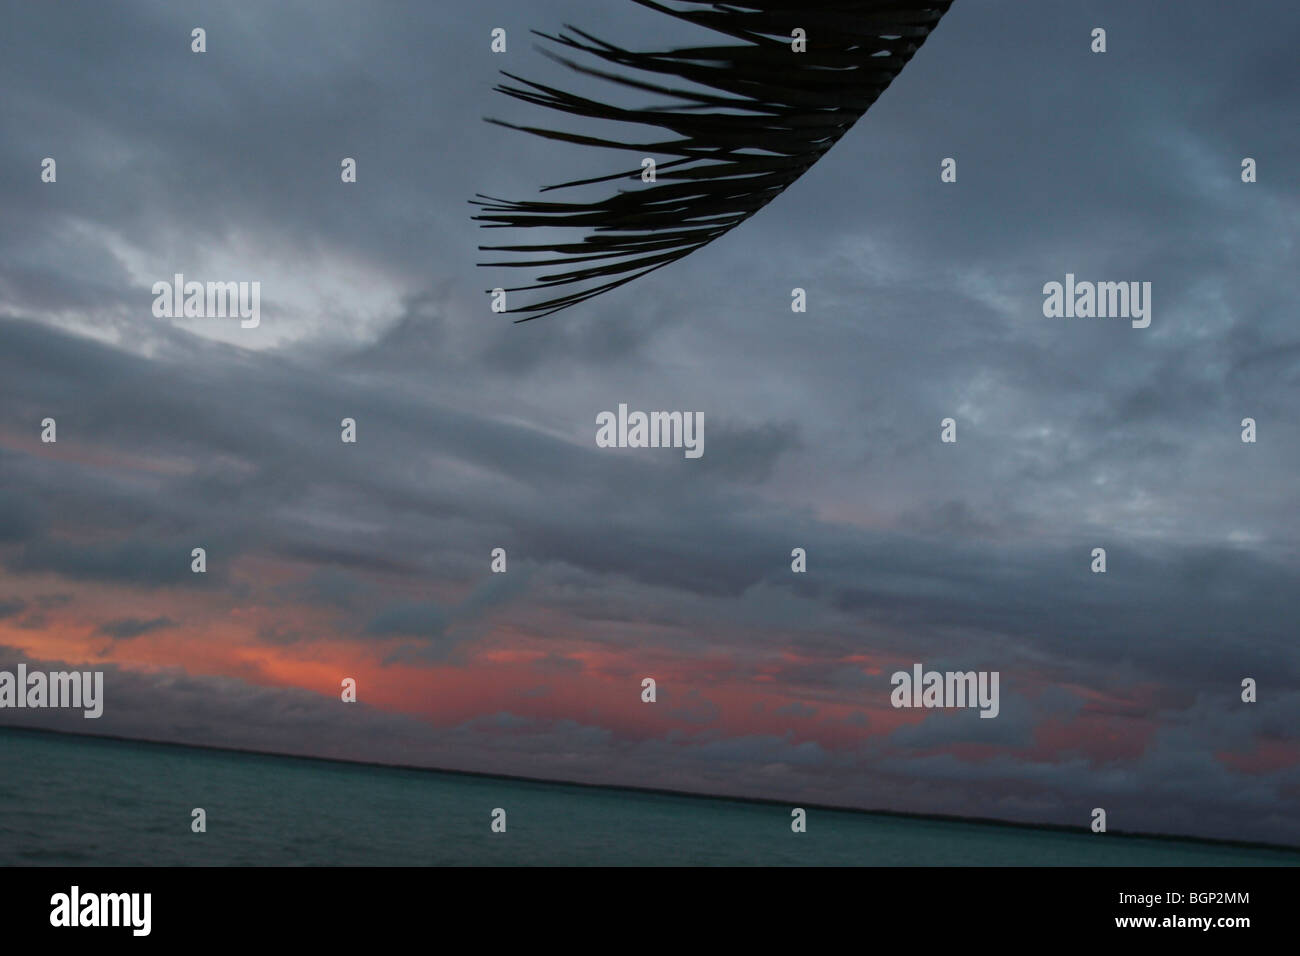 Dusk on the beach on the island of Kiribati in the Pacific Ocean - Stock Image